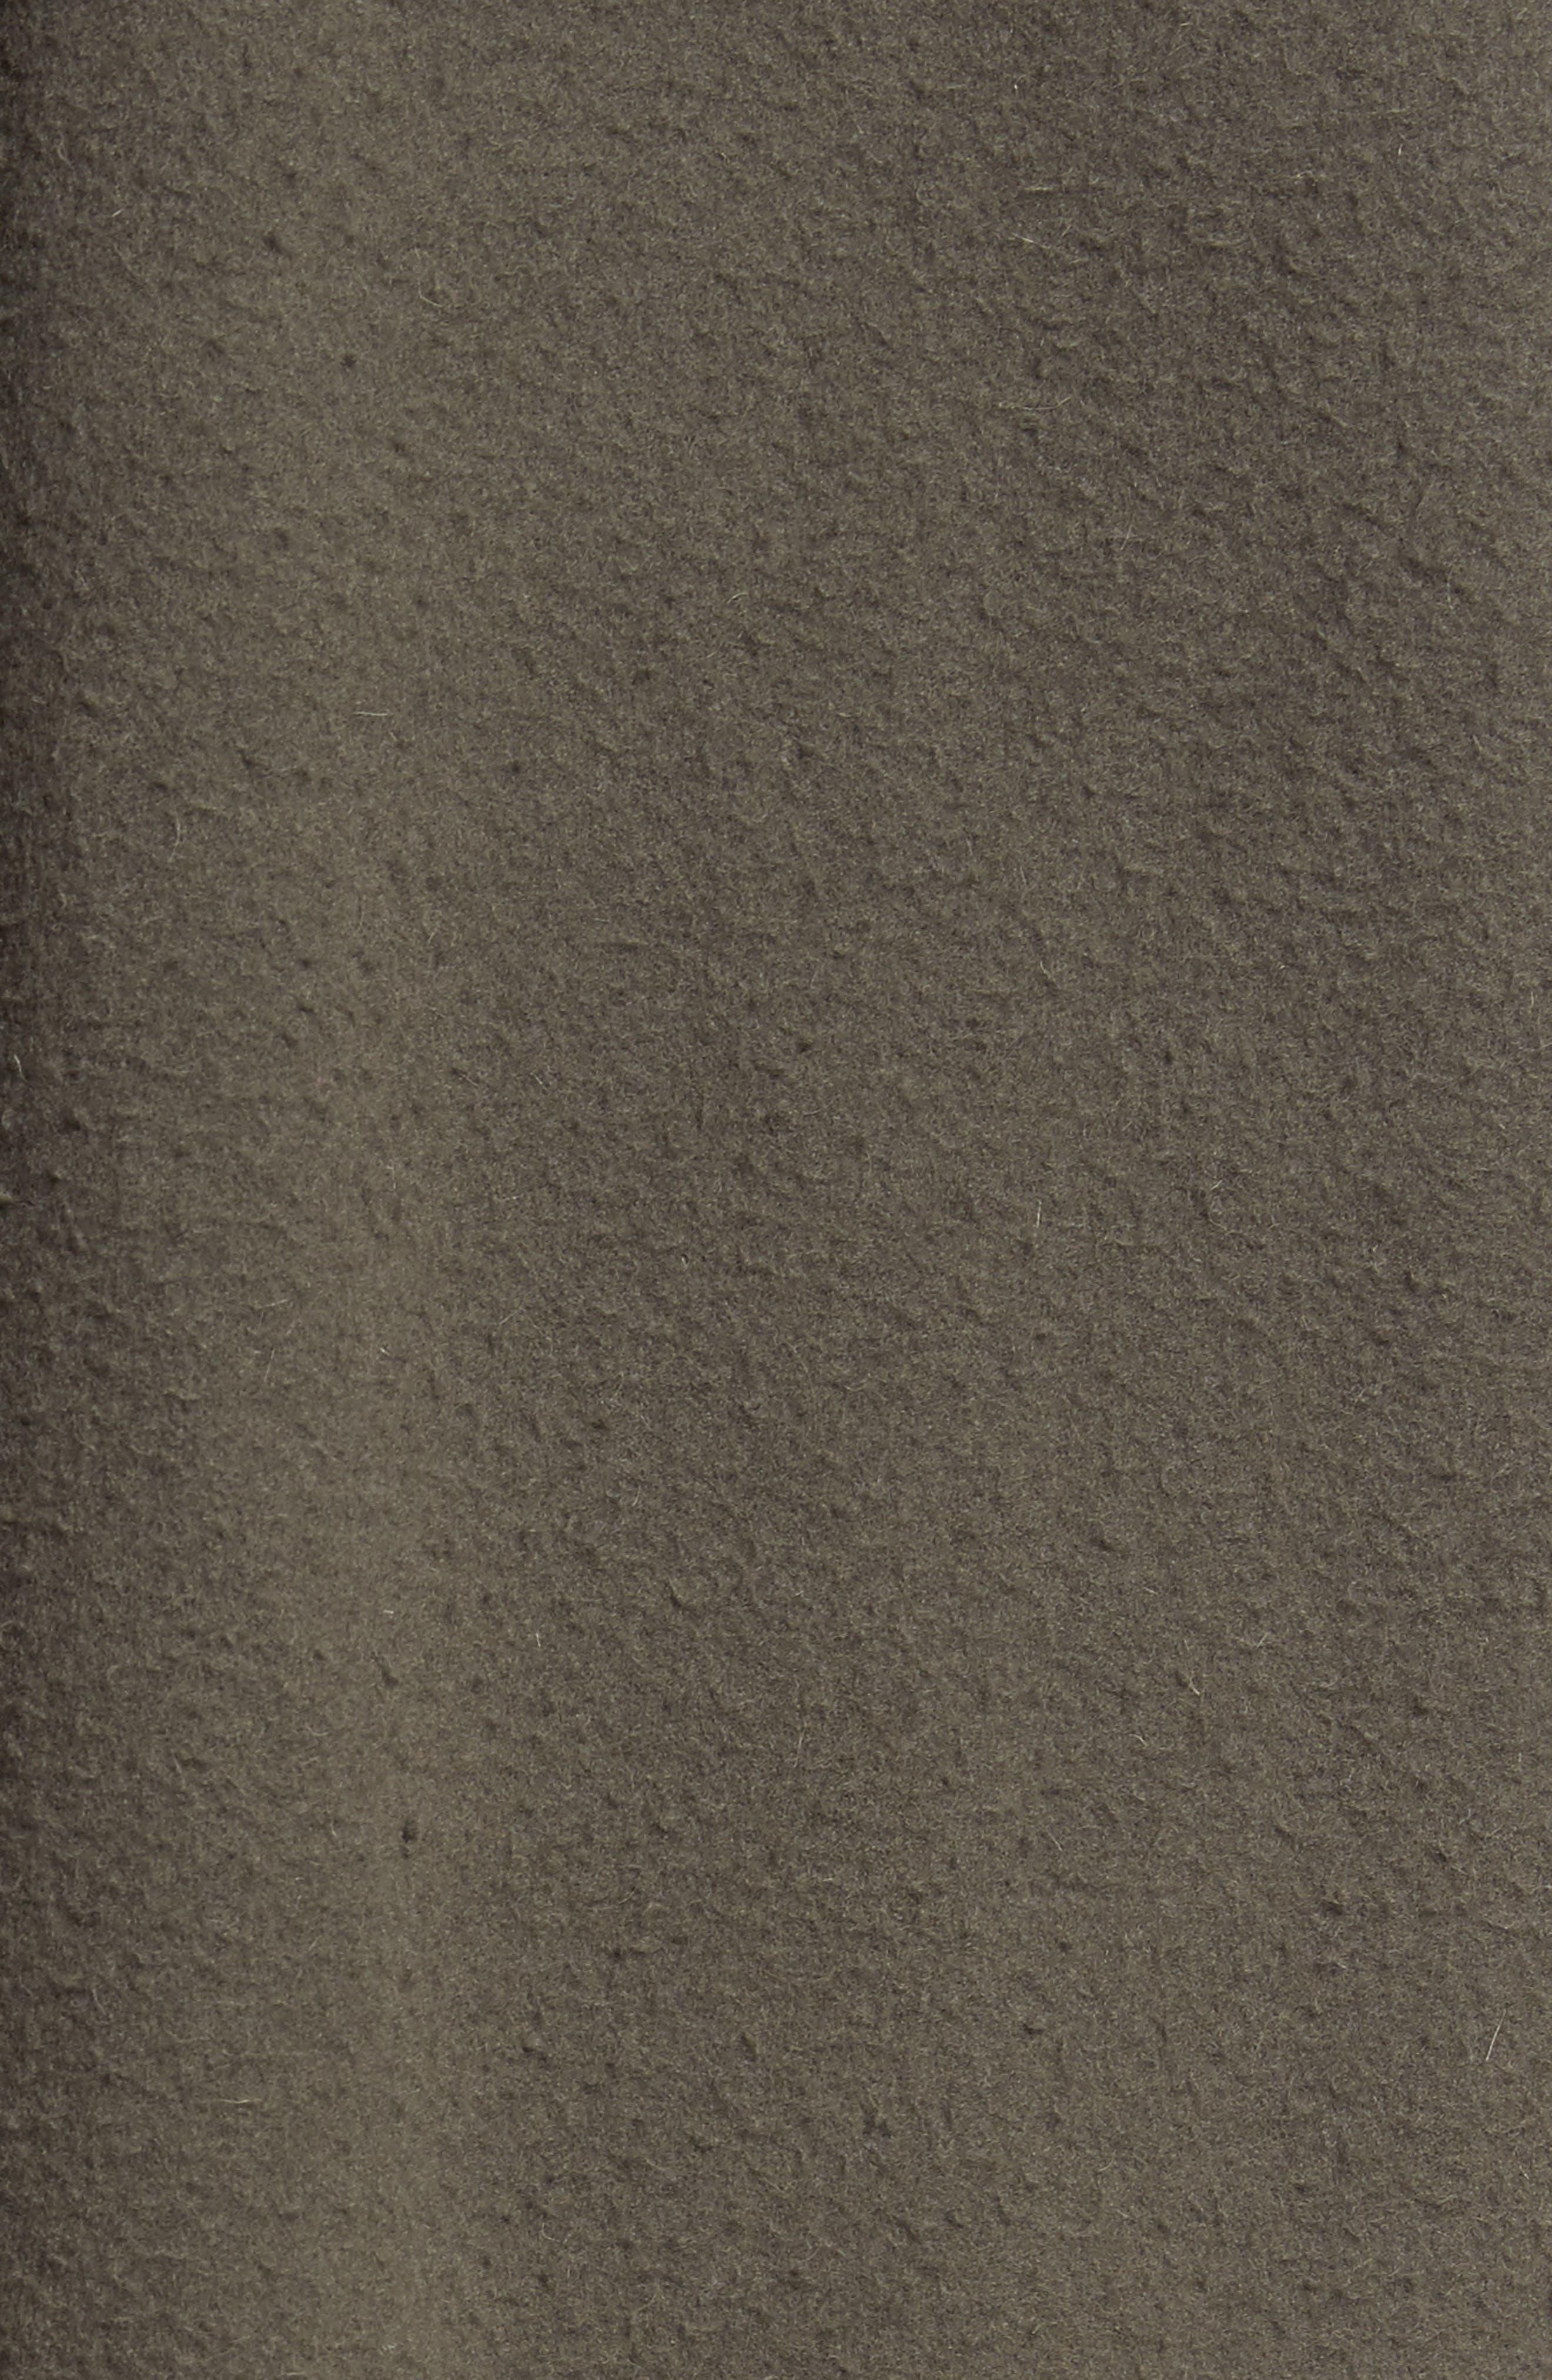 Distressed Wool Blend Car Coat,                             Alternate thumbnail 6, color,                             310